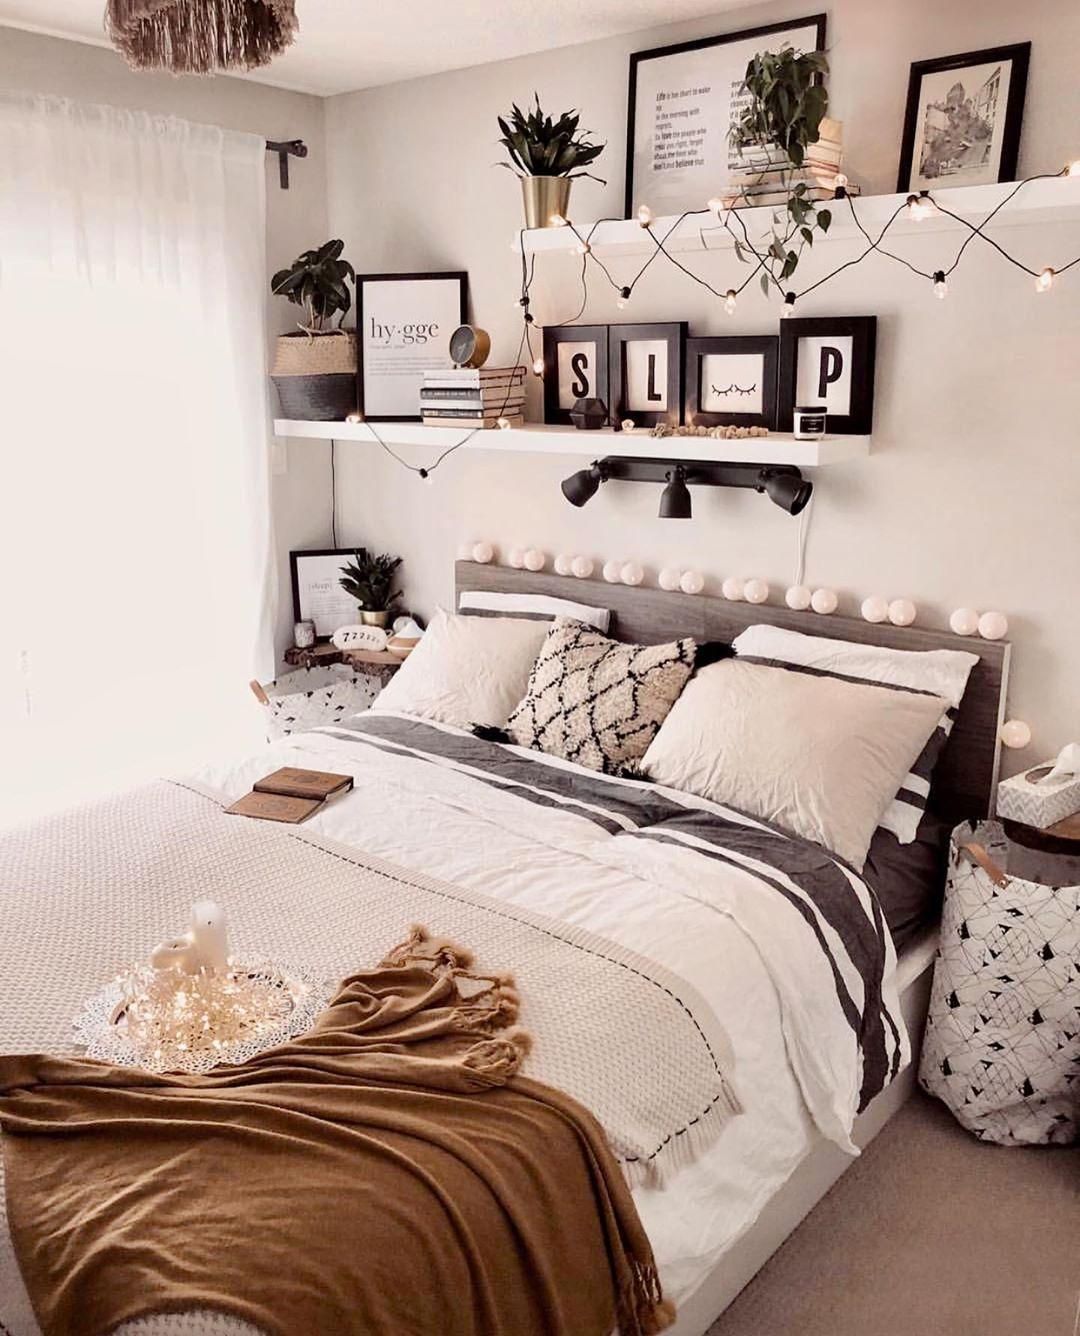 Amazing Isn T This Gorgeous Follow Modernbedspace Follow Modernbedspace Hello Since The Hygge Seas Bedroom Decor Room Decor Simple Bedroom